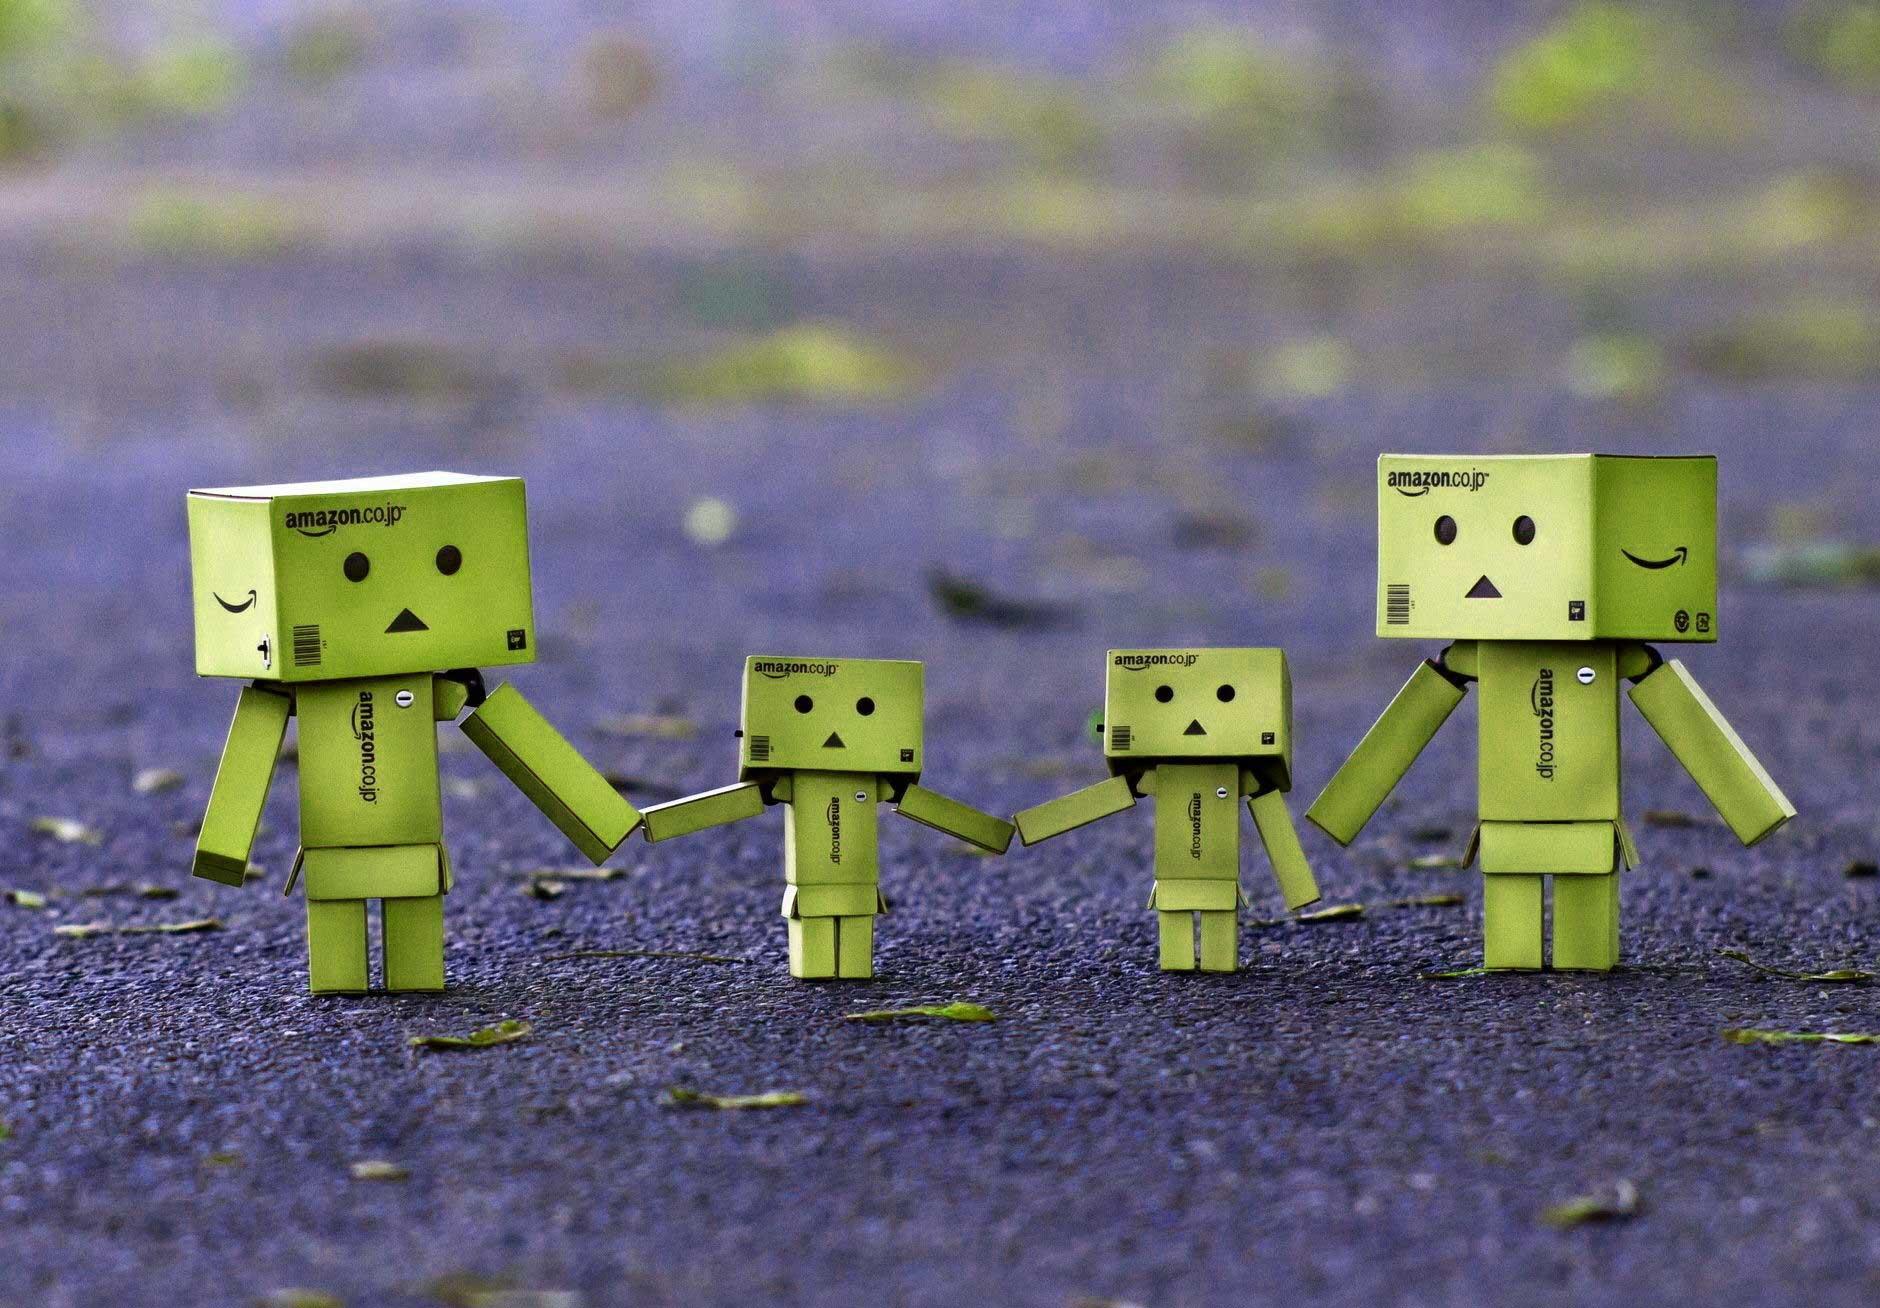 Family Group Whatsapp DP